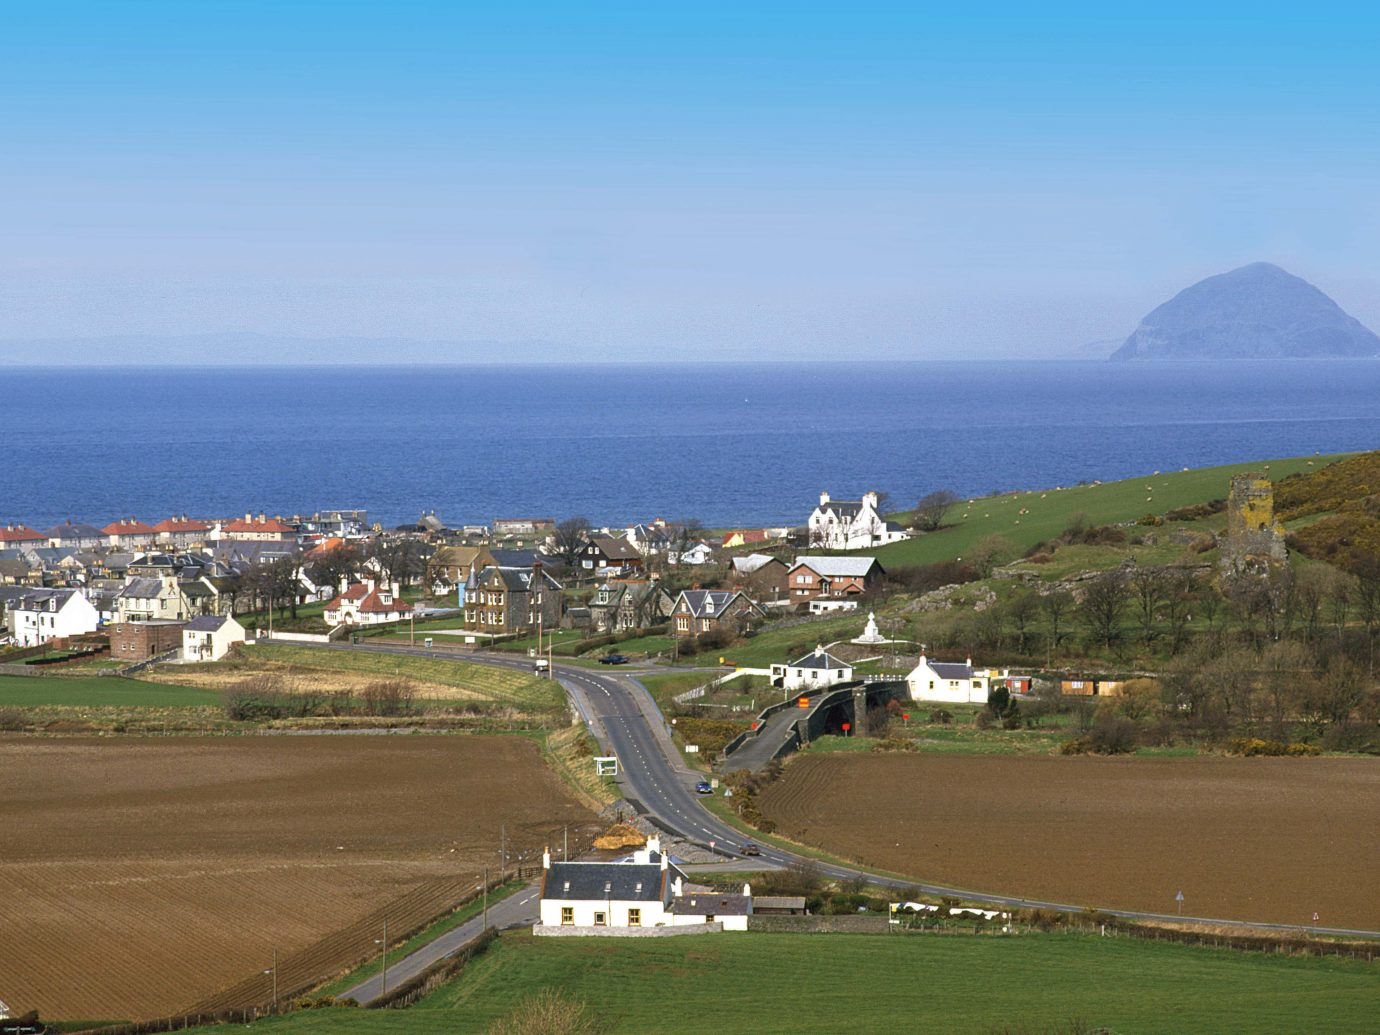 Ballantrae village in Scotland